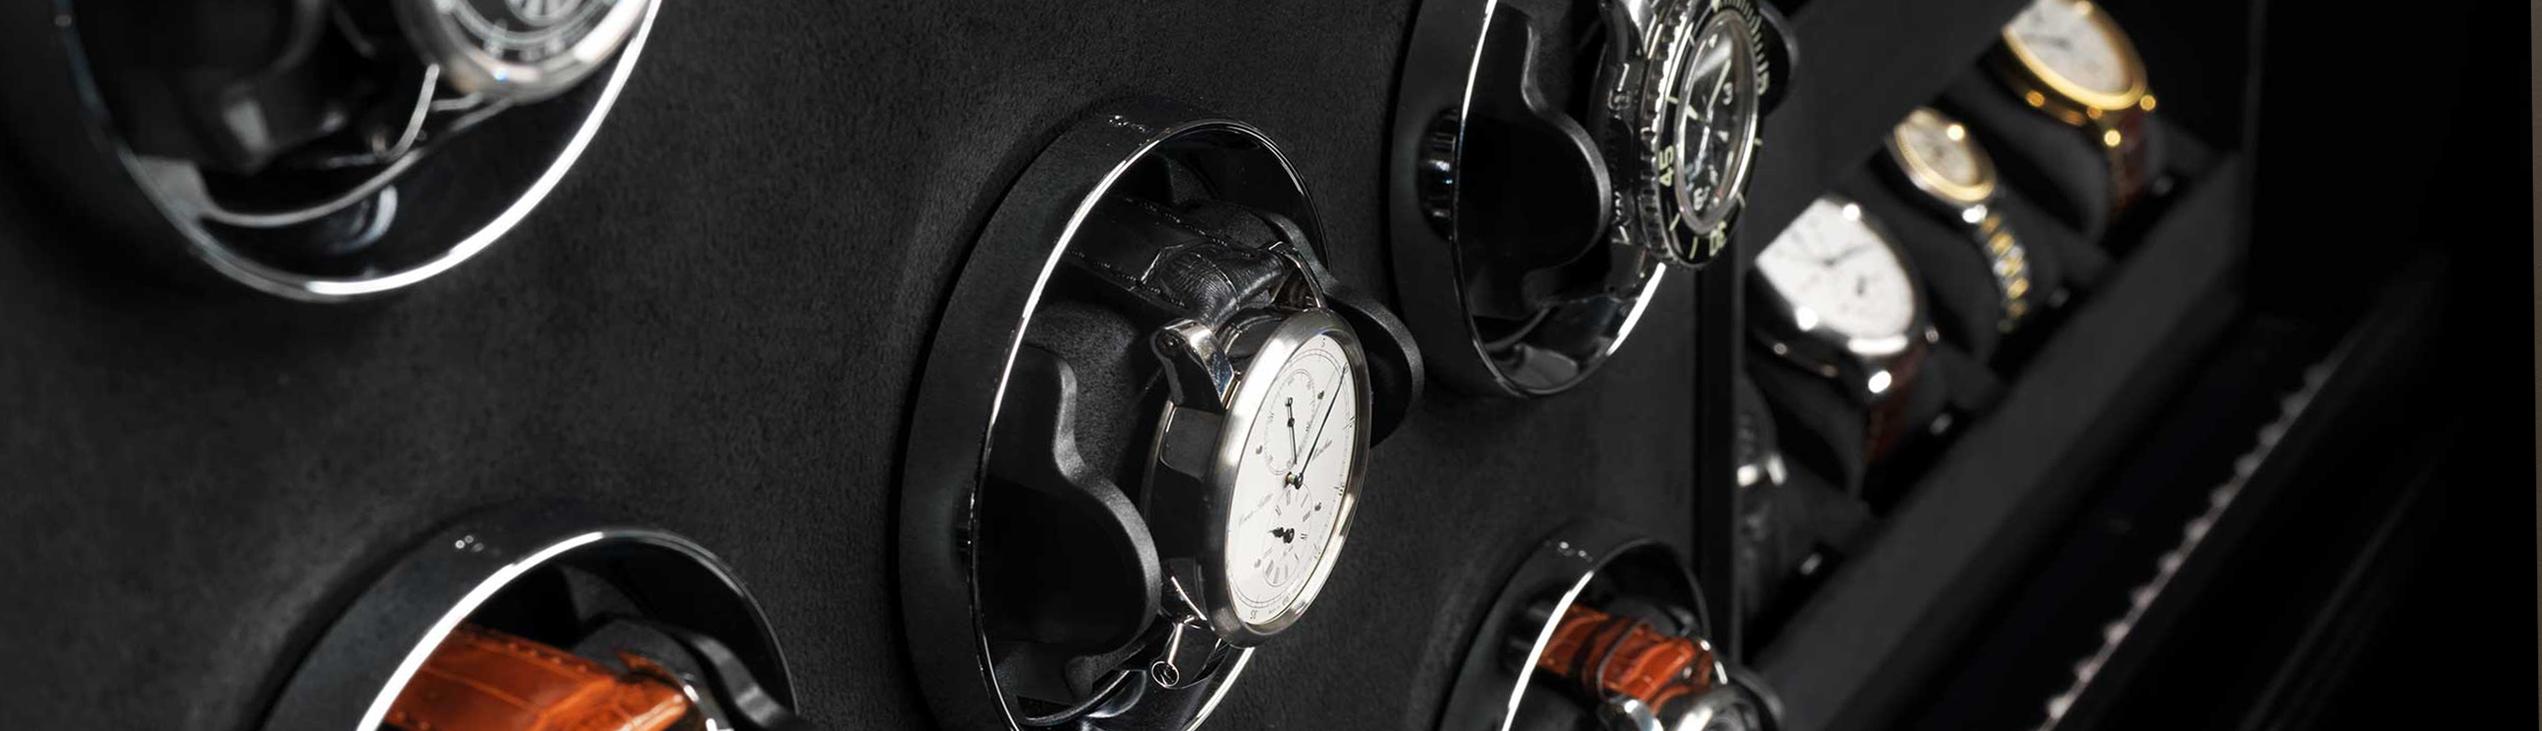 KATEGORIE Uhrenbeweger